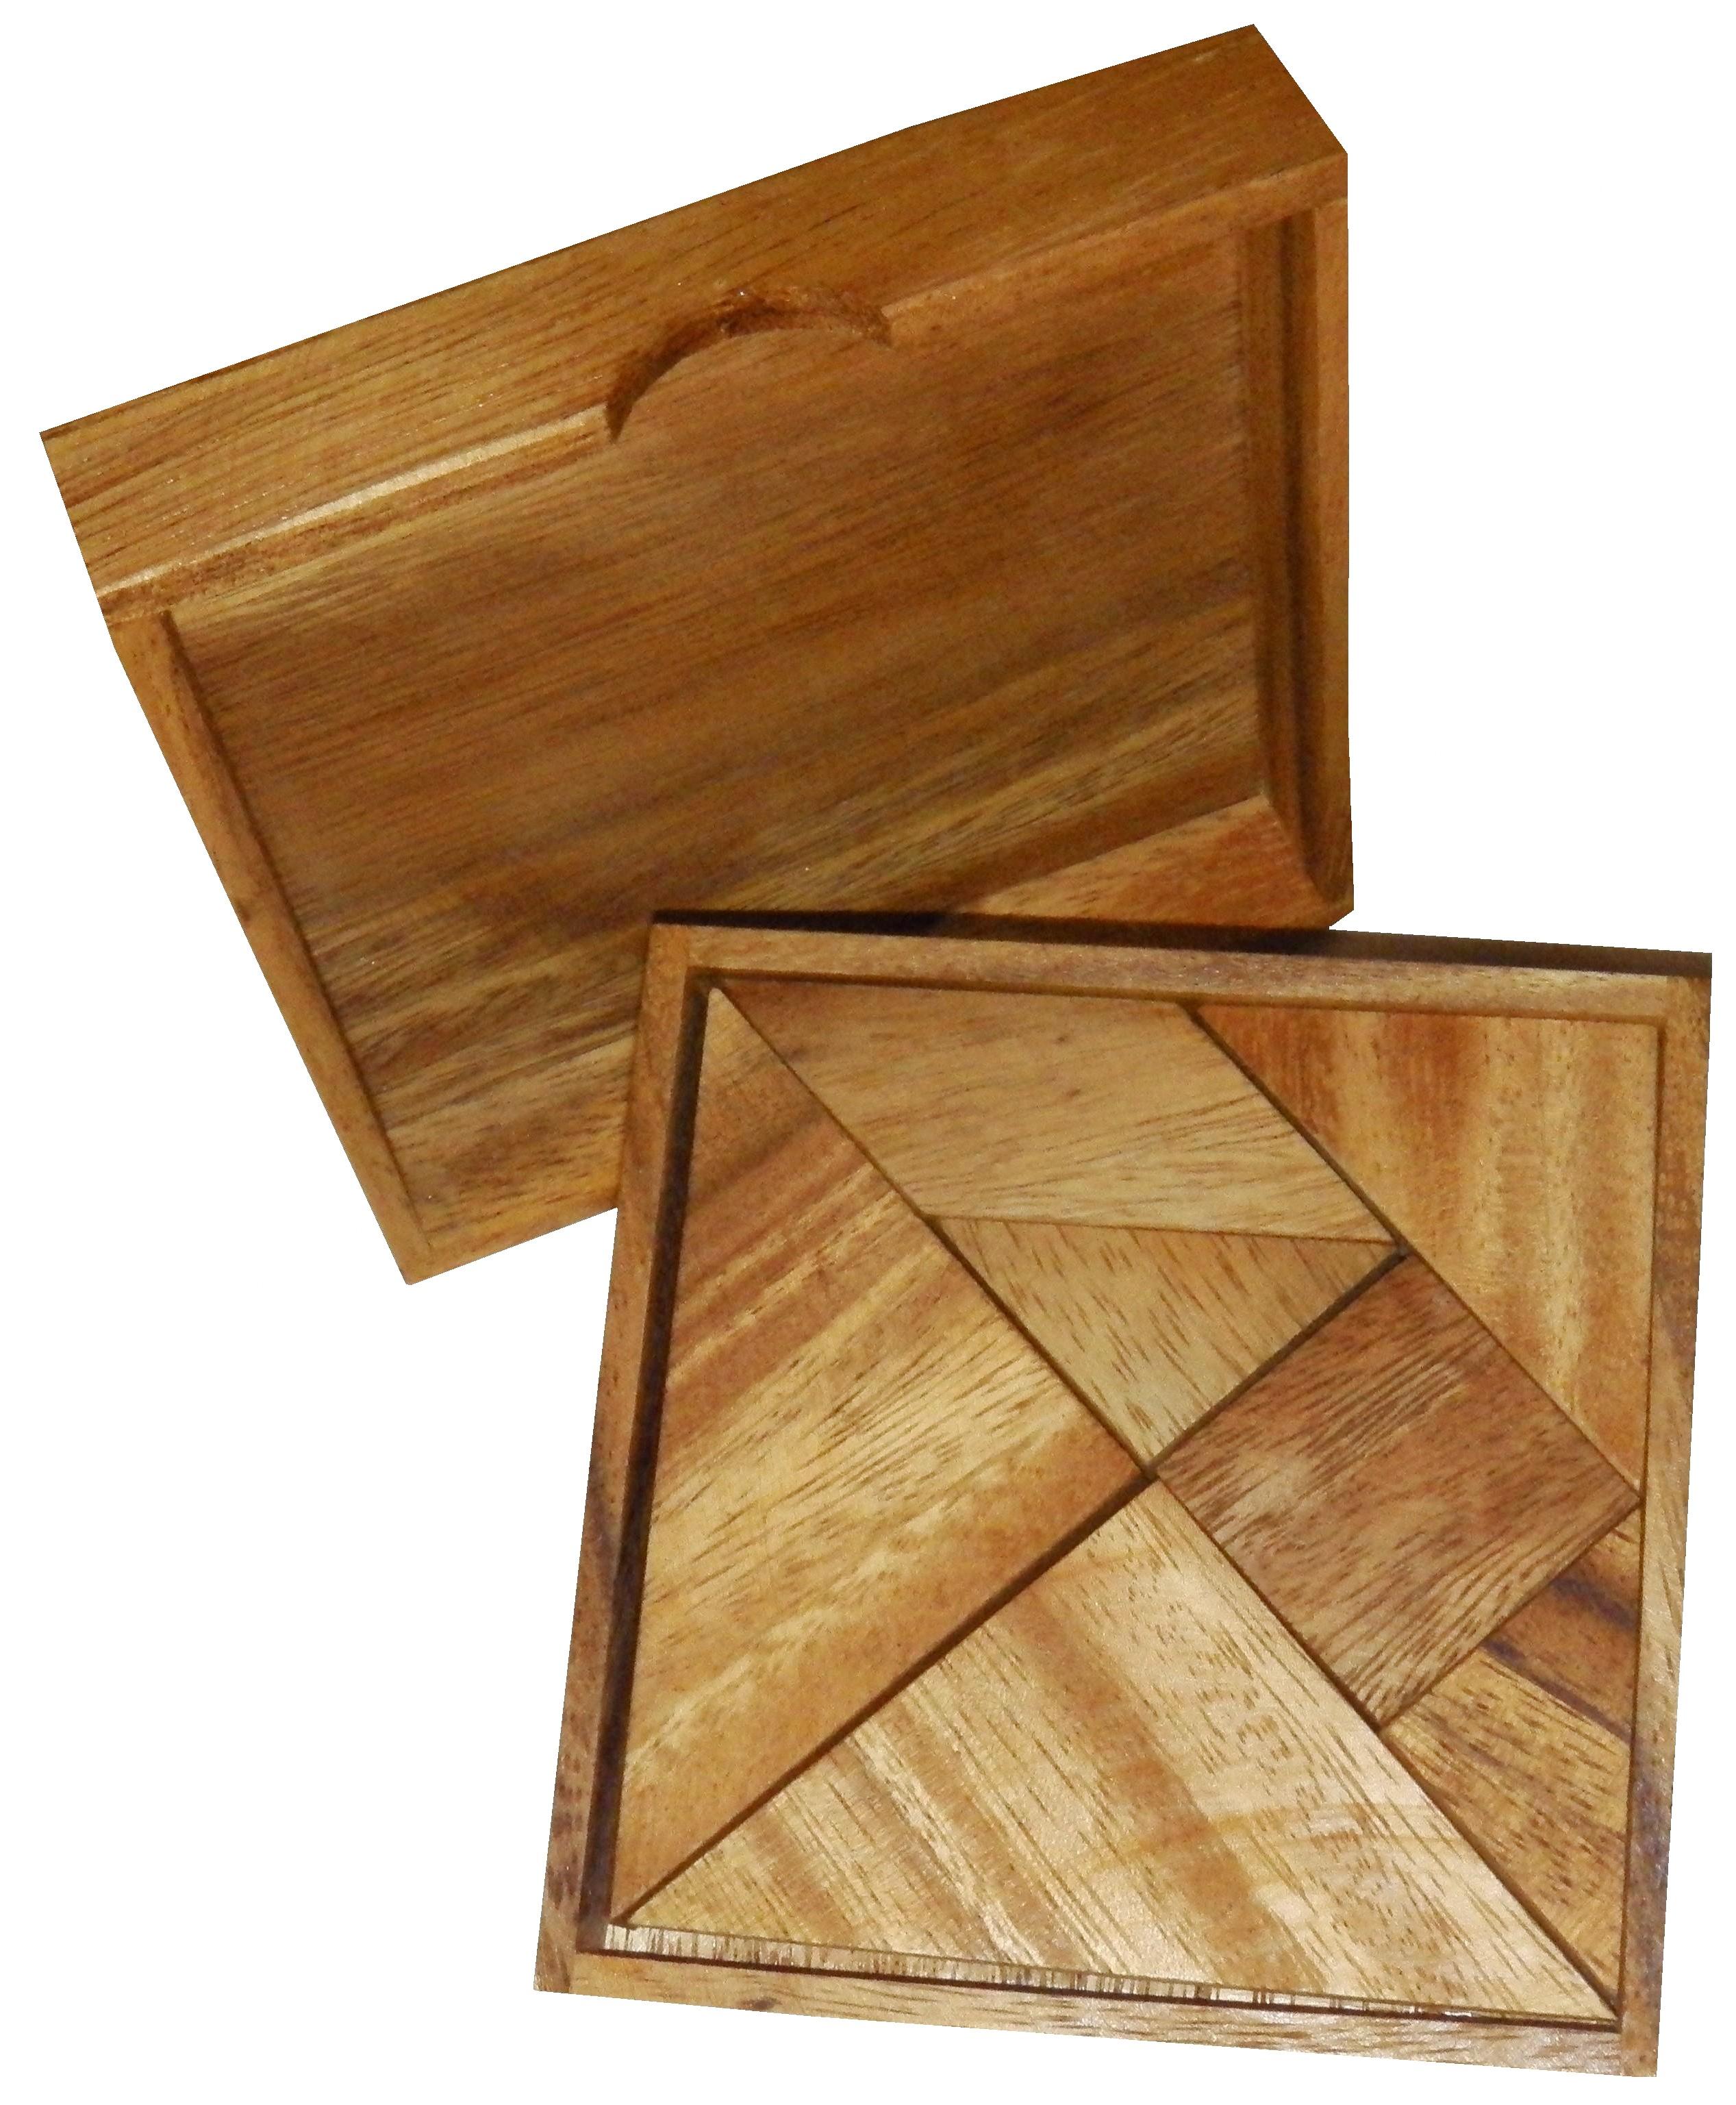 Tangram JBD Casse tetes en bois # Solution Casse Tete En Bois